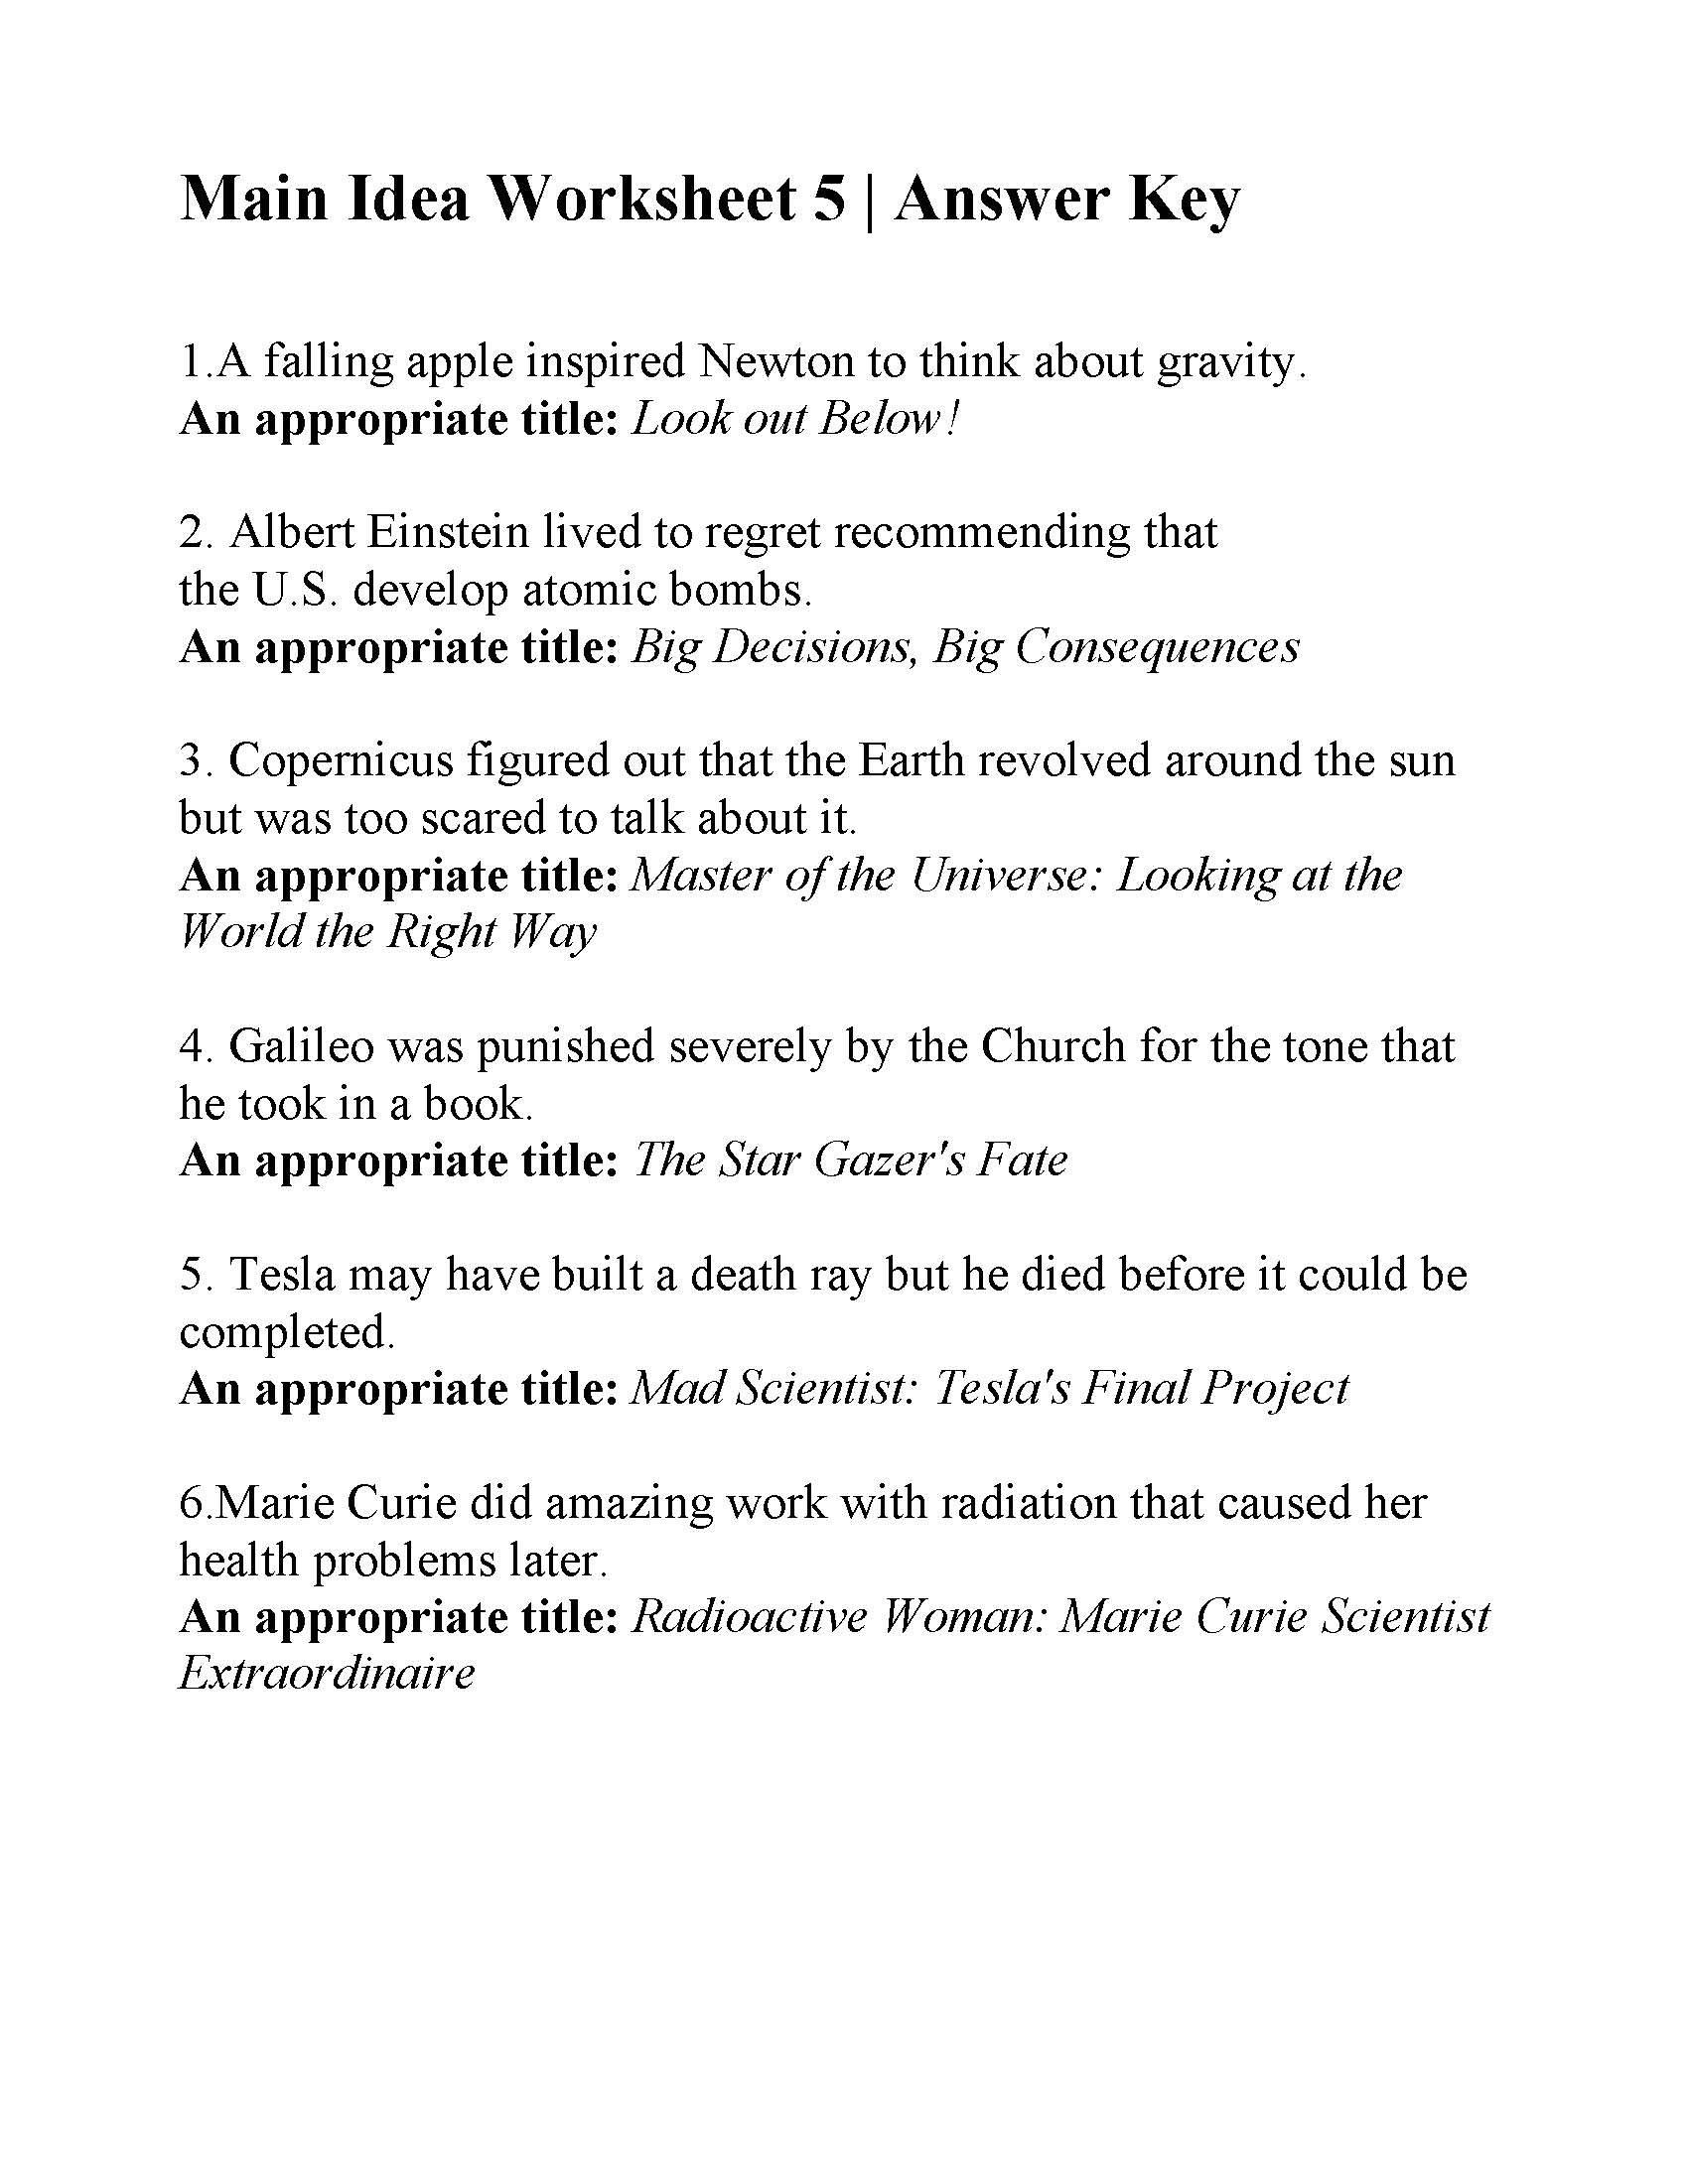 Main Idea Worksheet 5  Answers Or Main Idea Worksheets